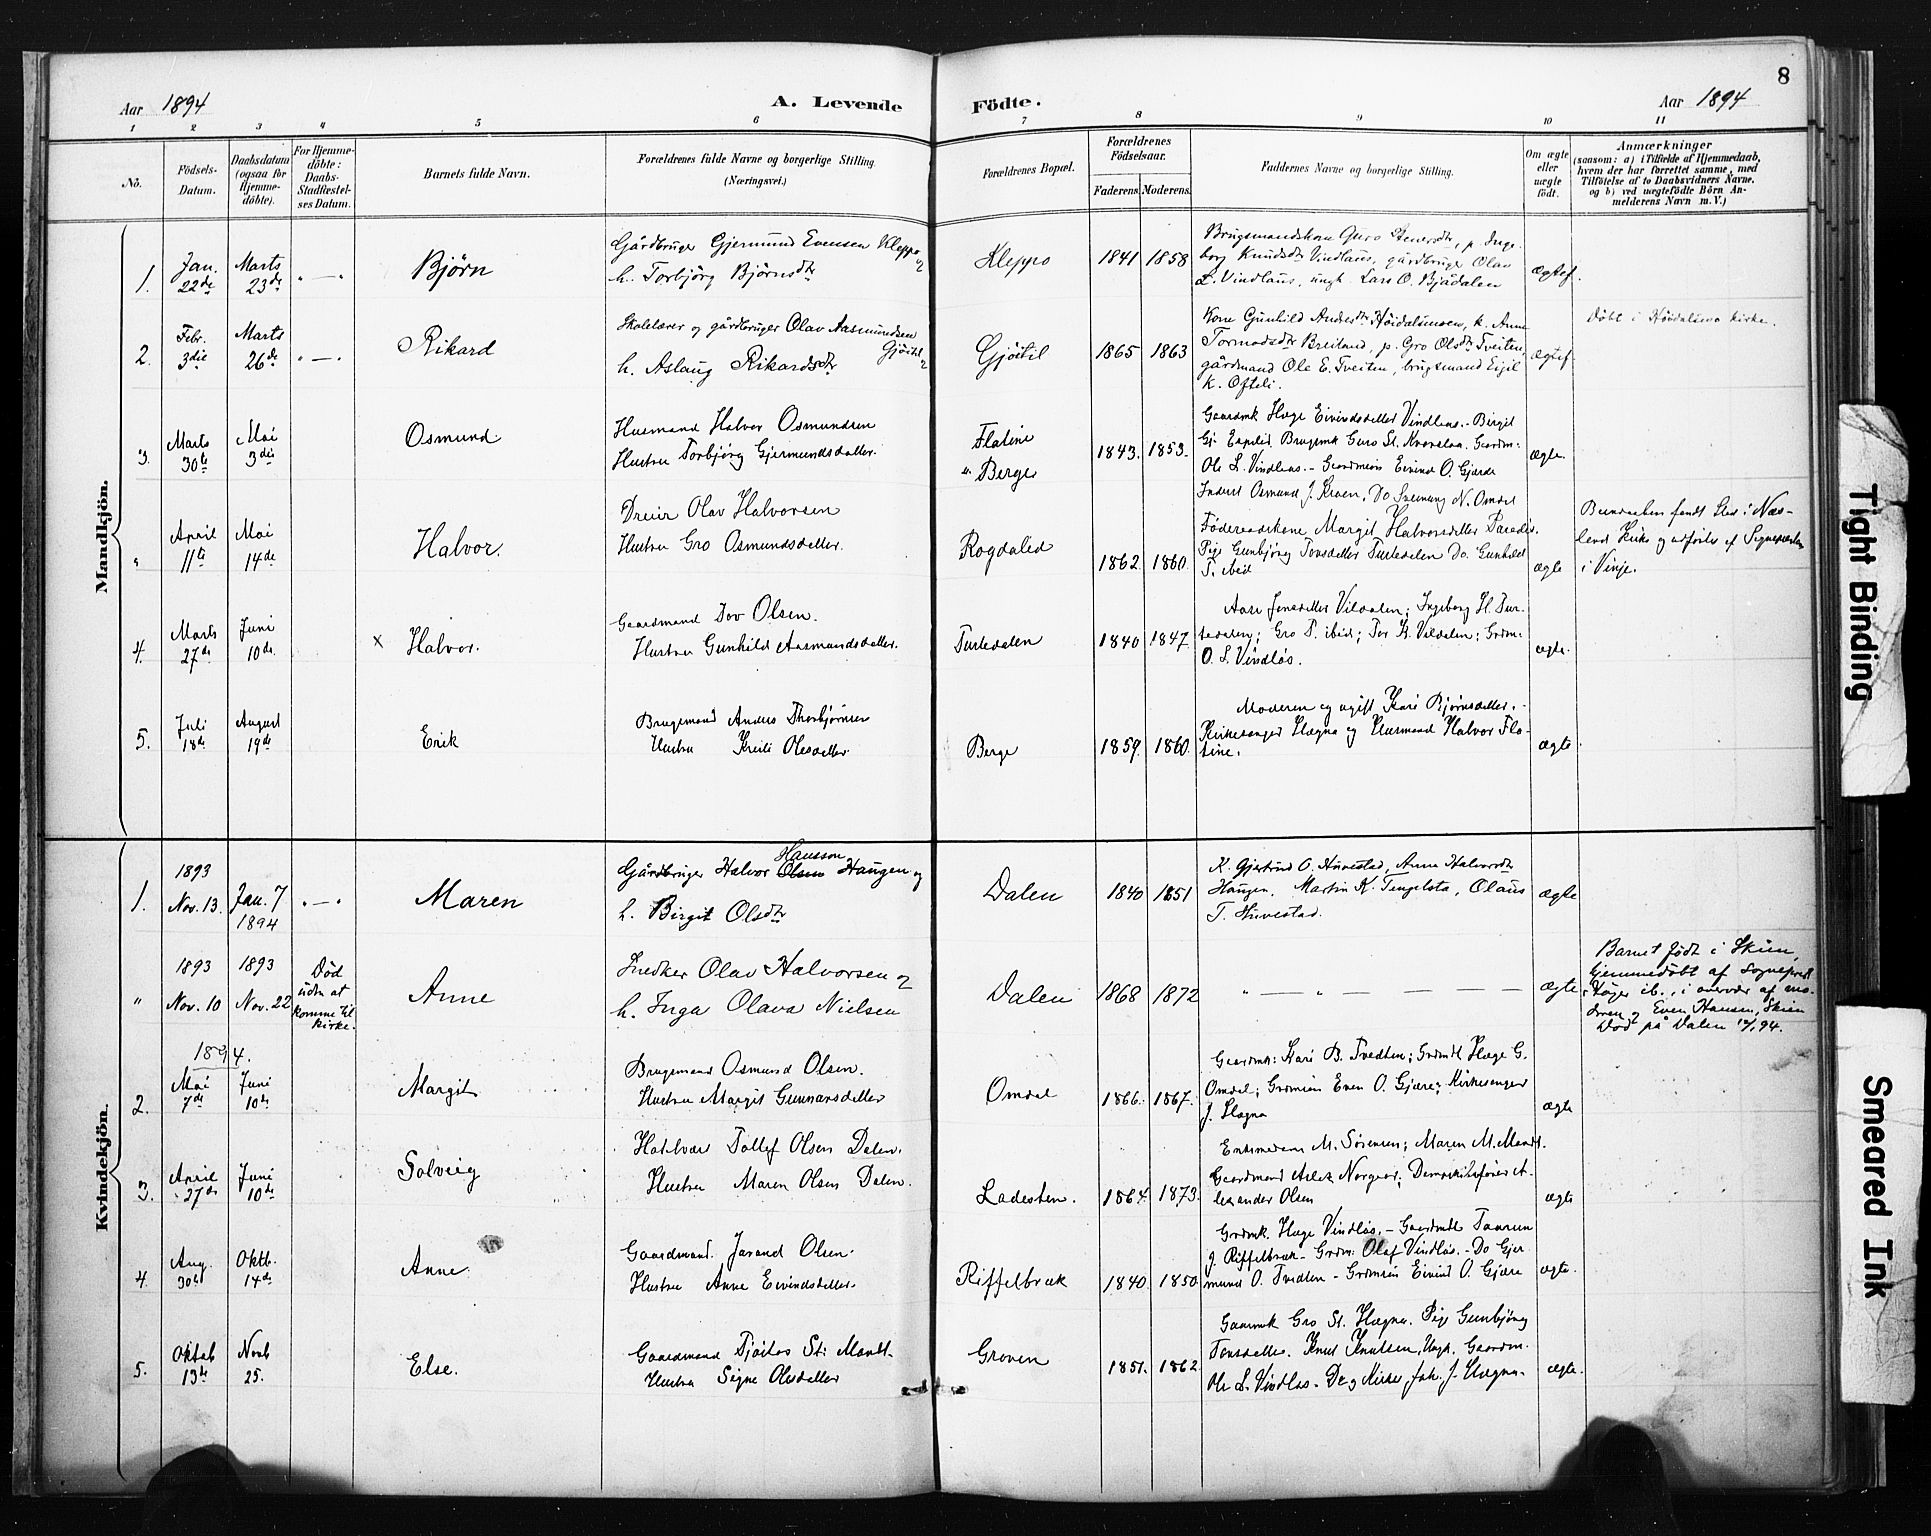 SAKO, Lårdal kirkebøker, F/Fb/L0002: Ministerialbok nr. II 2, 1887-1918, s. 8